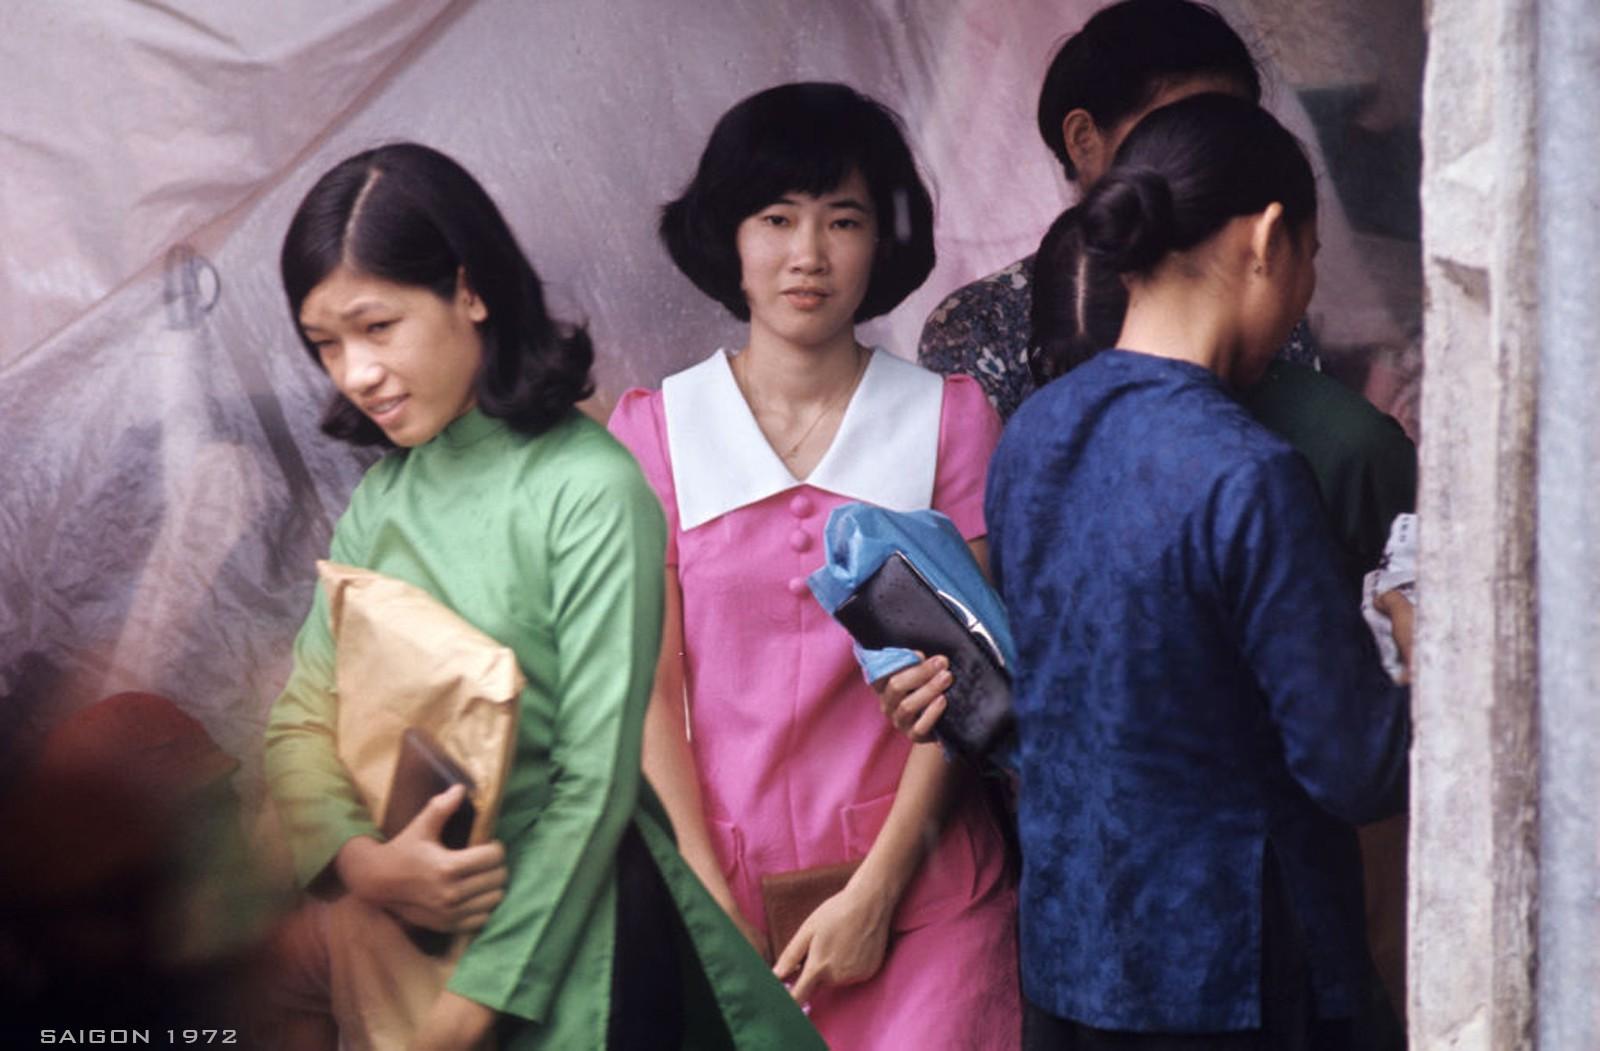 Interesting photos of Saigon women in 1972 under US photographer's lens